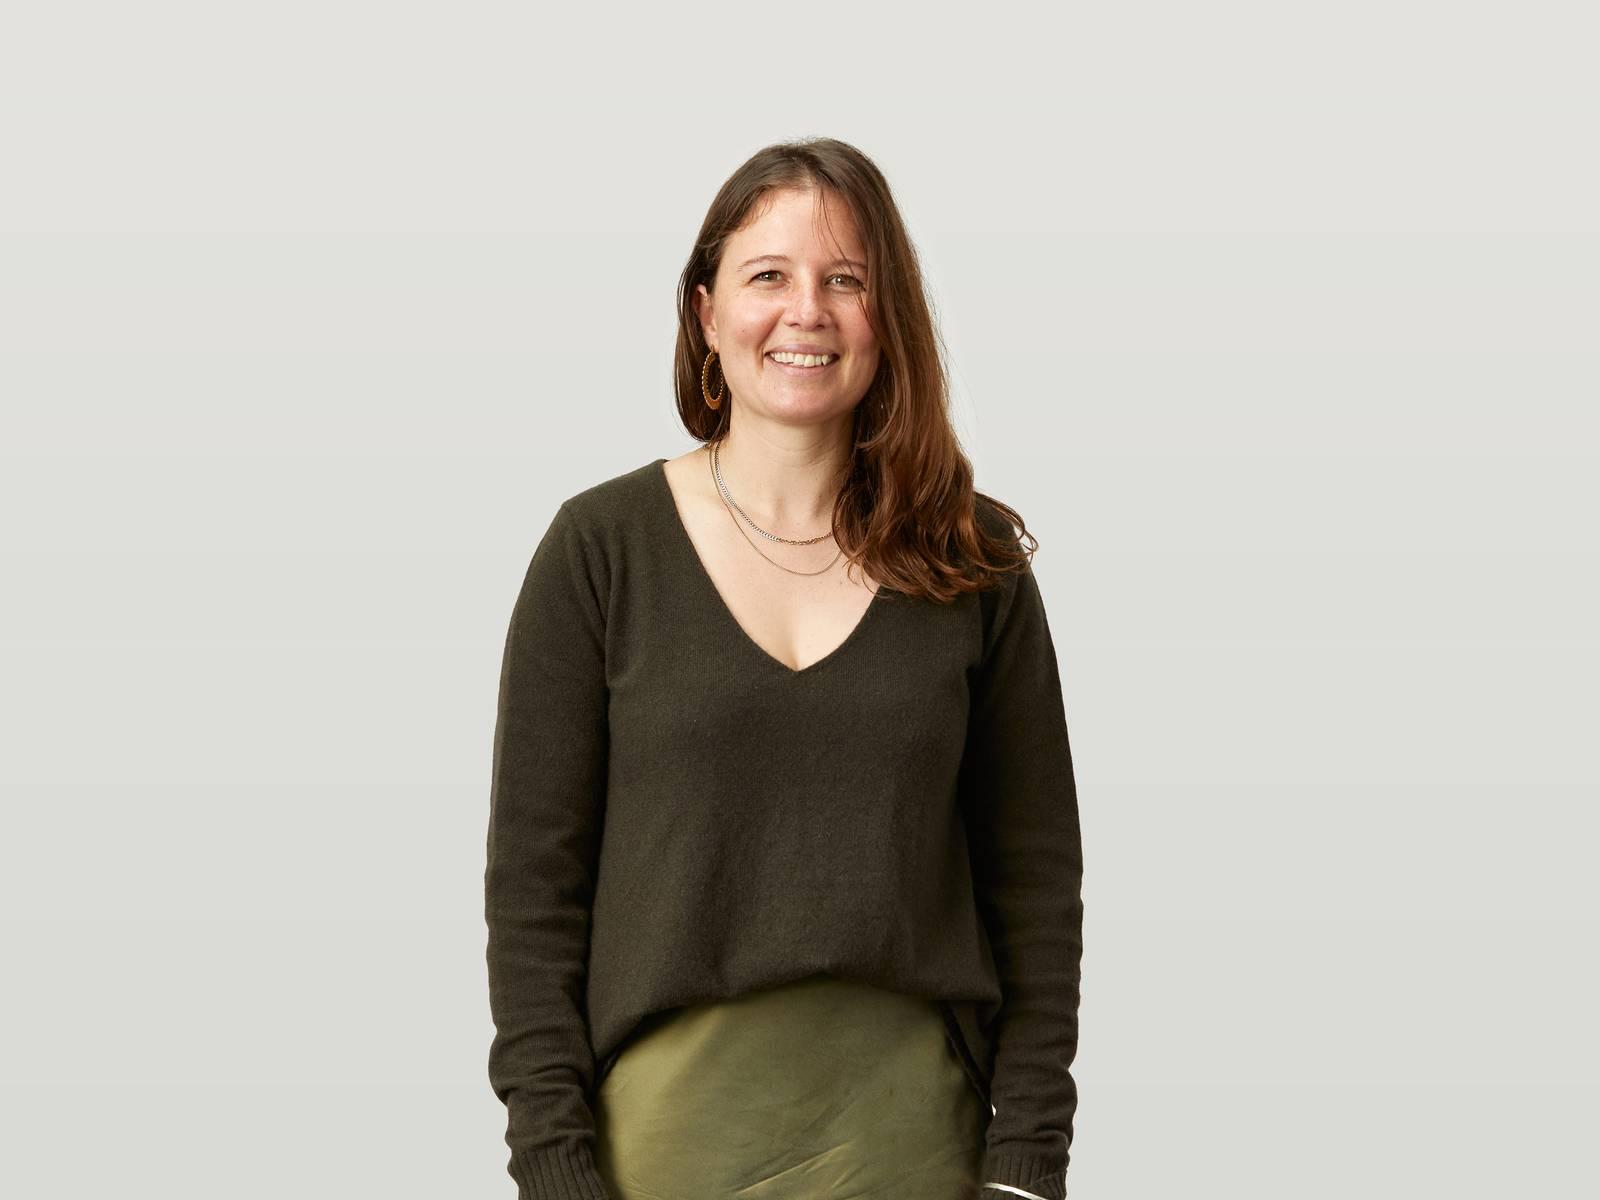 A profile image of Sarah Beresford